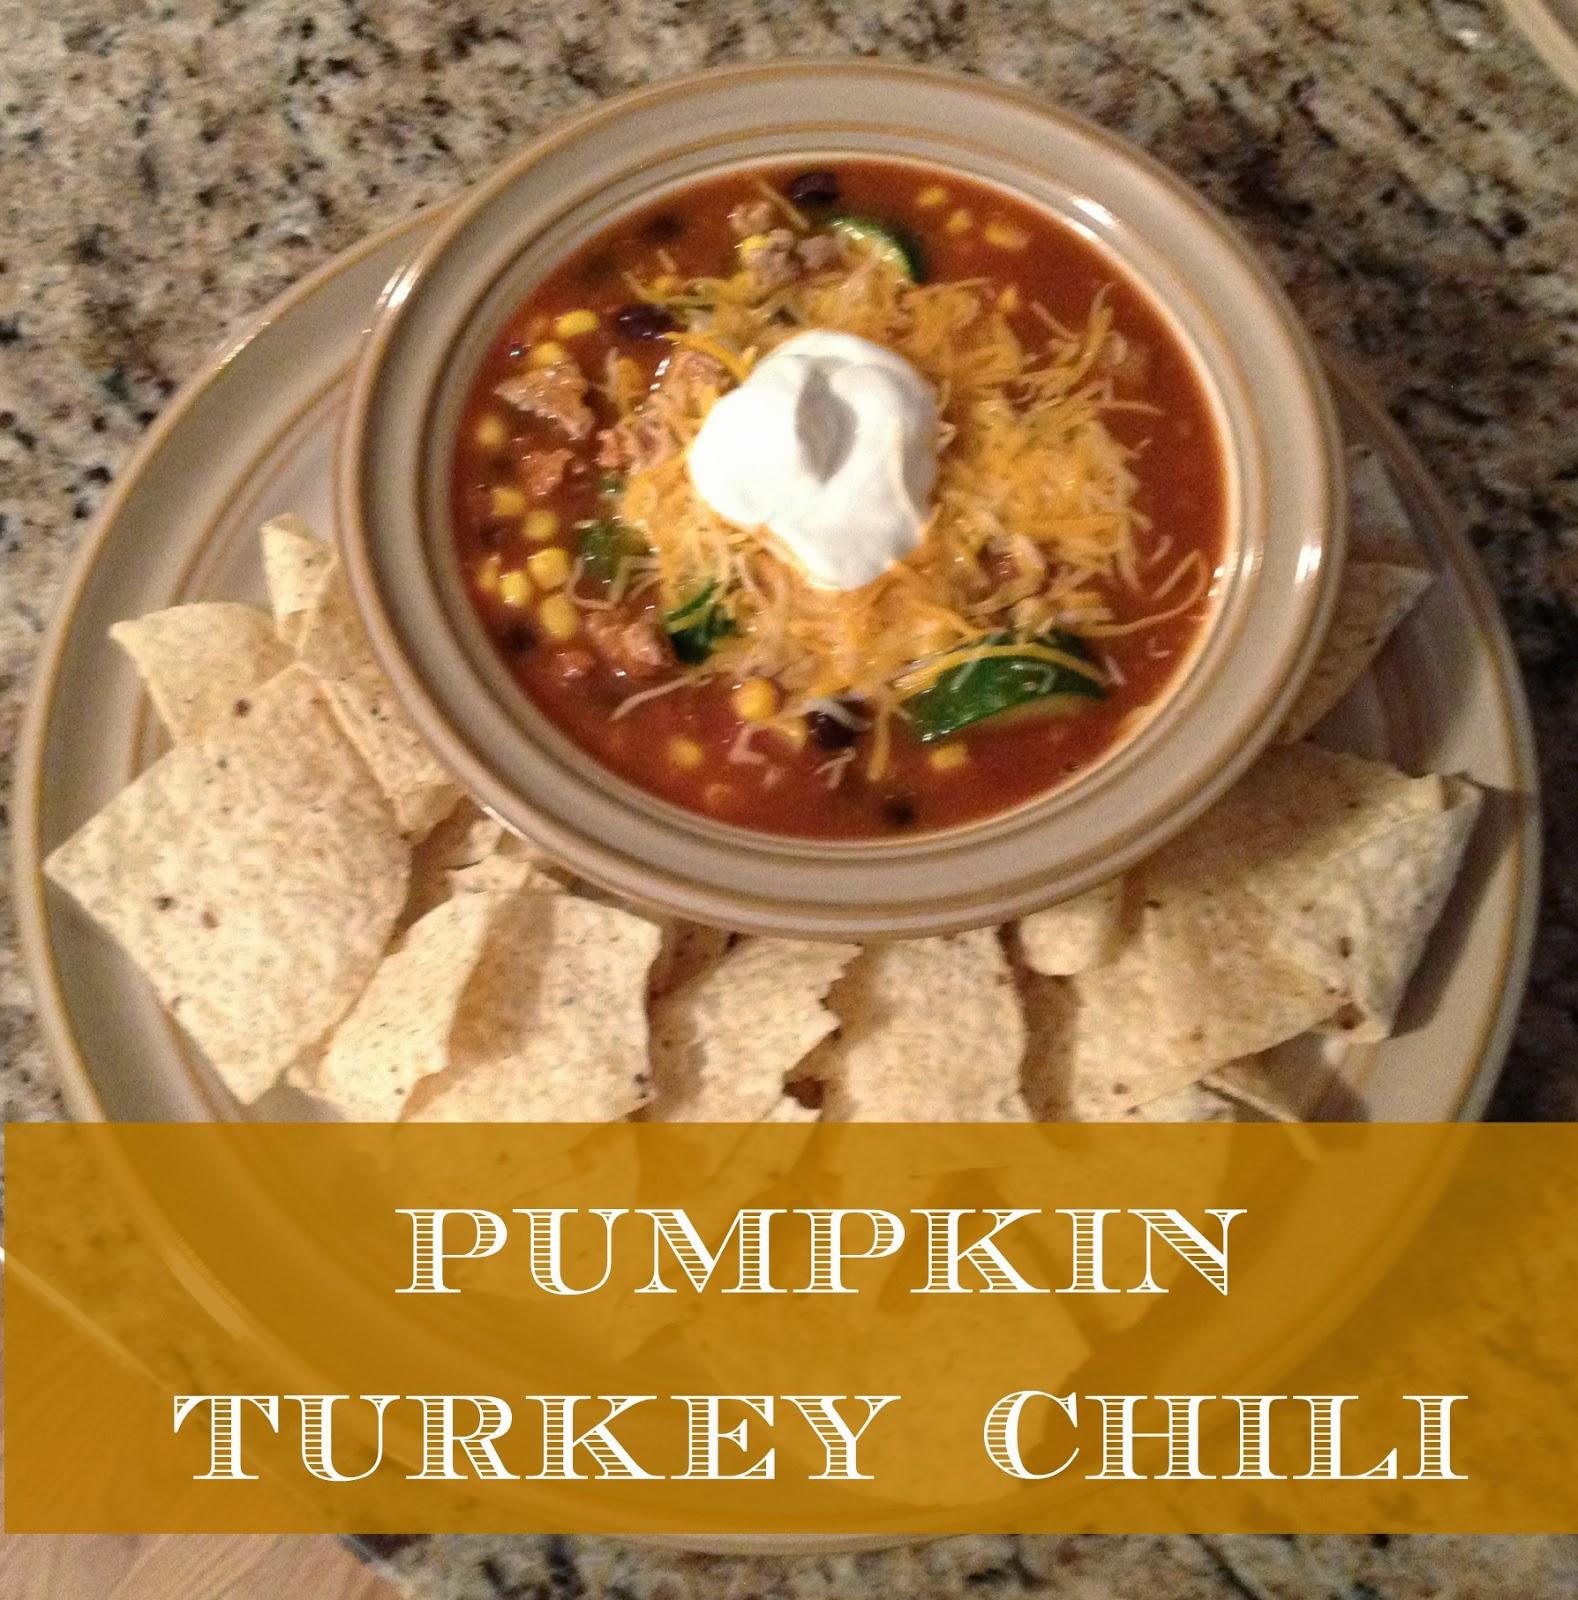 With a Faithful Heart: Pumpkin Turkey Chili